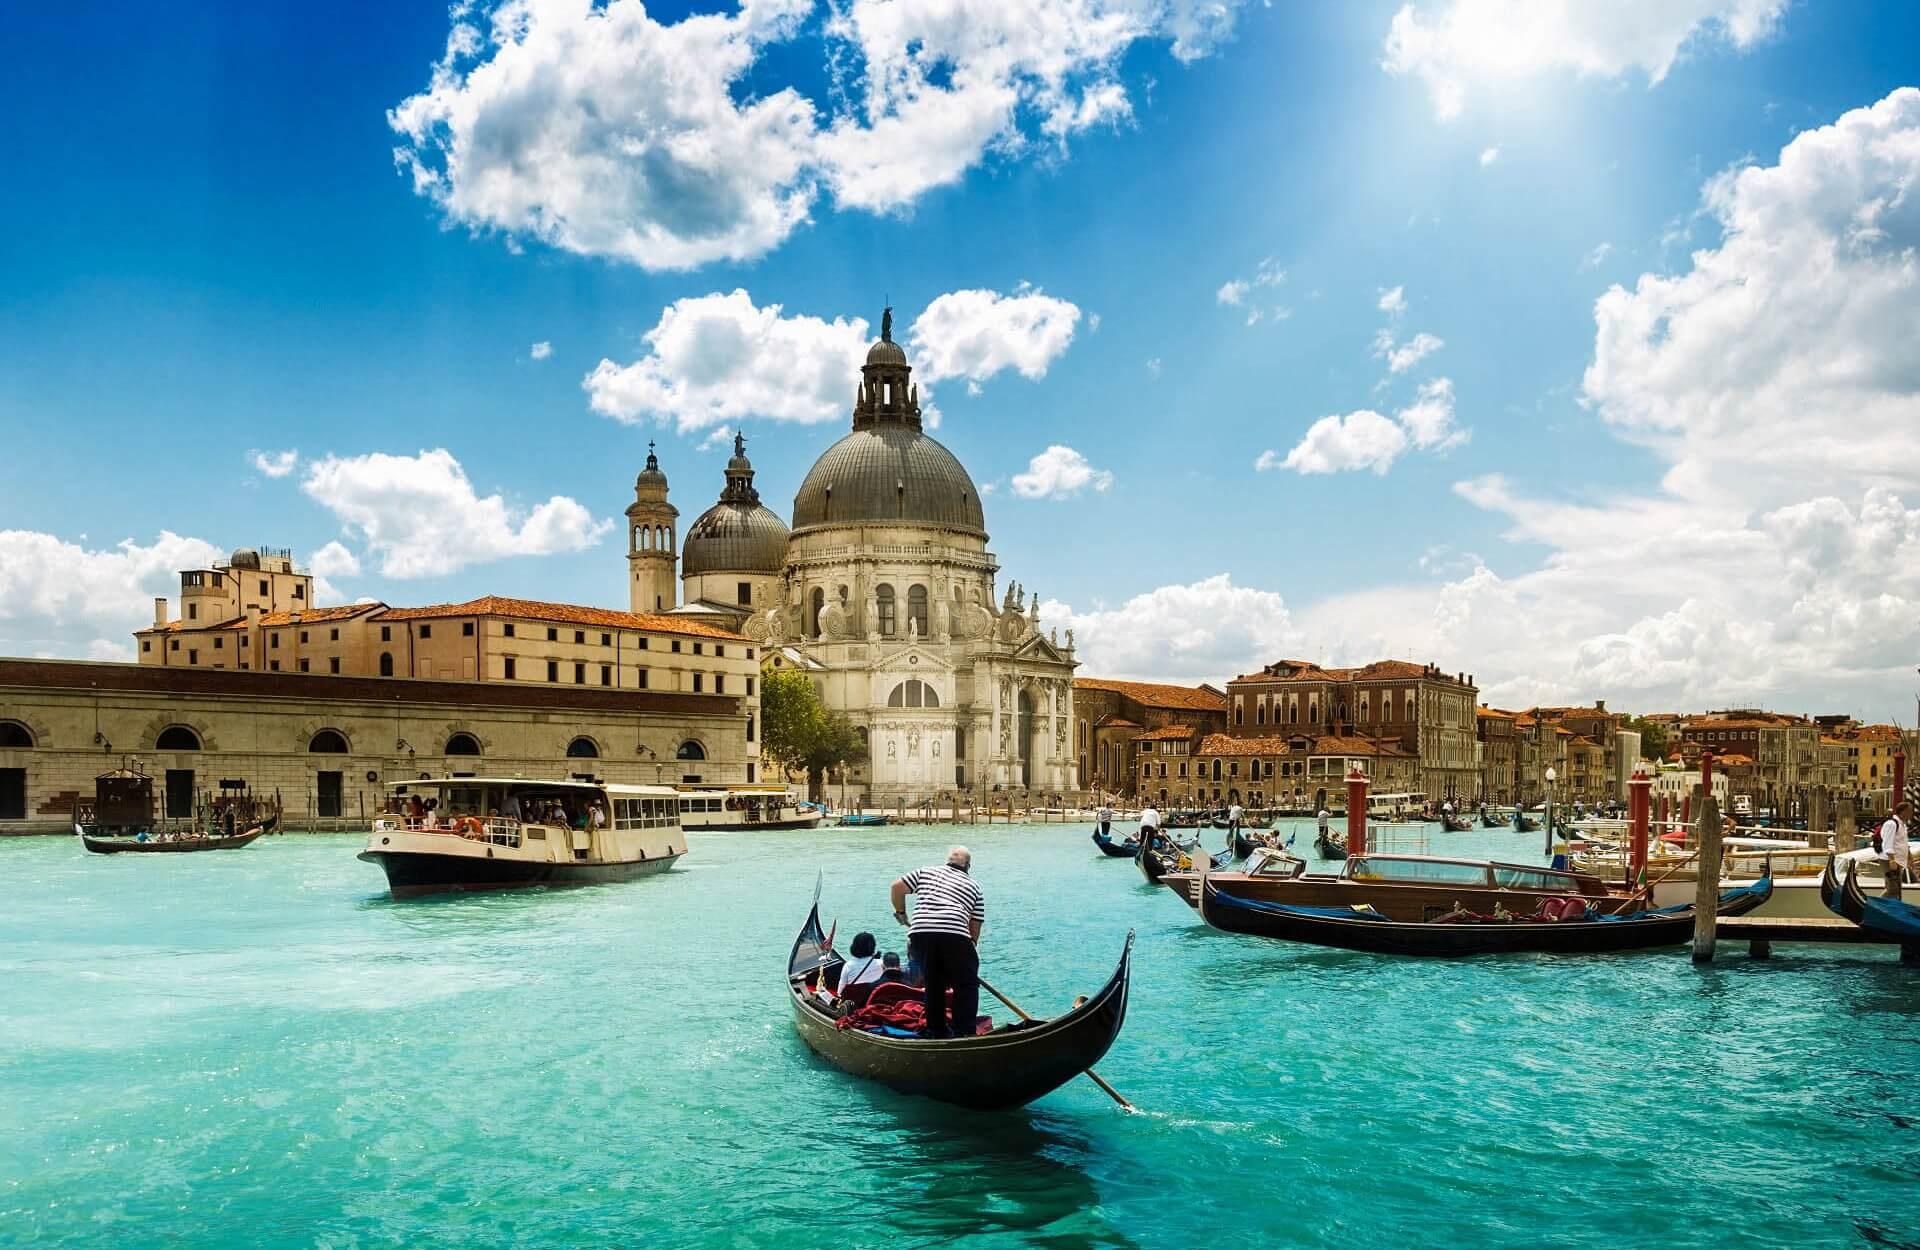 Flüge: Stuttgart - Bologna, Bergamo, Venedig oder Wien ab 8,12€ im März